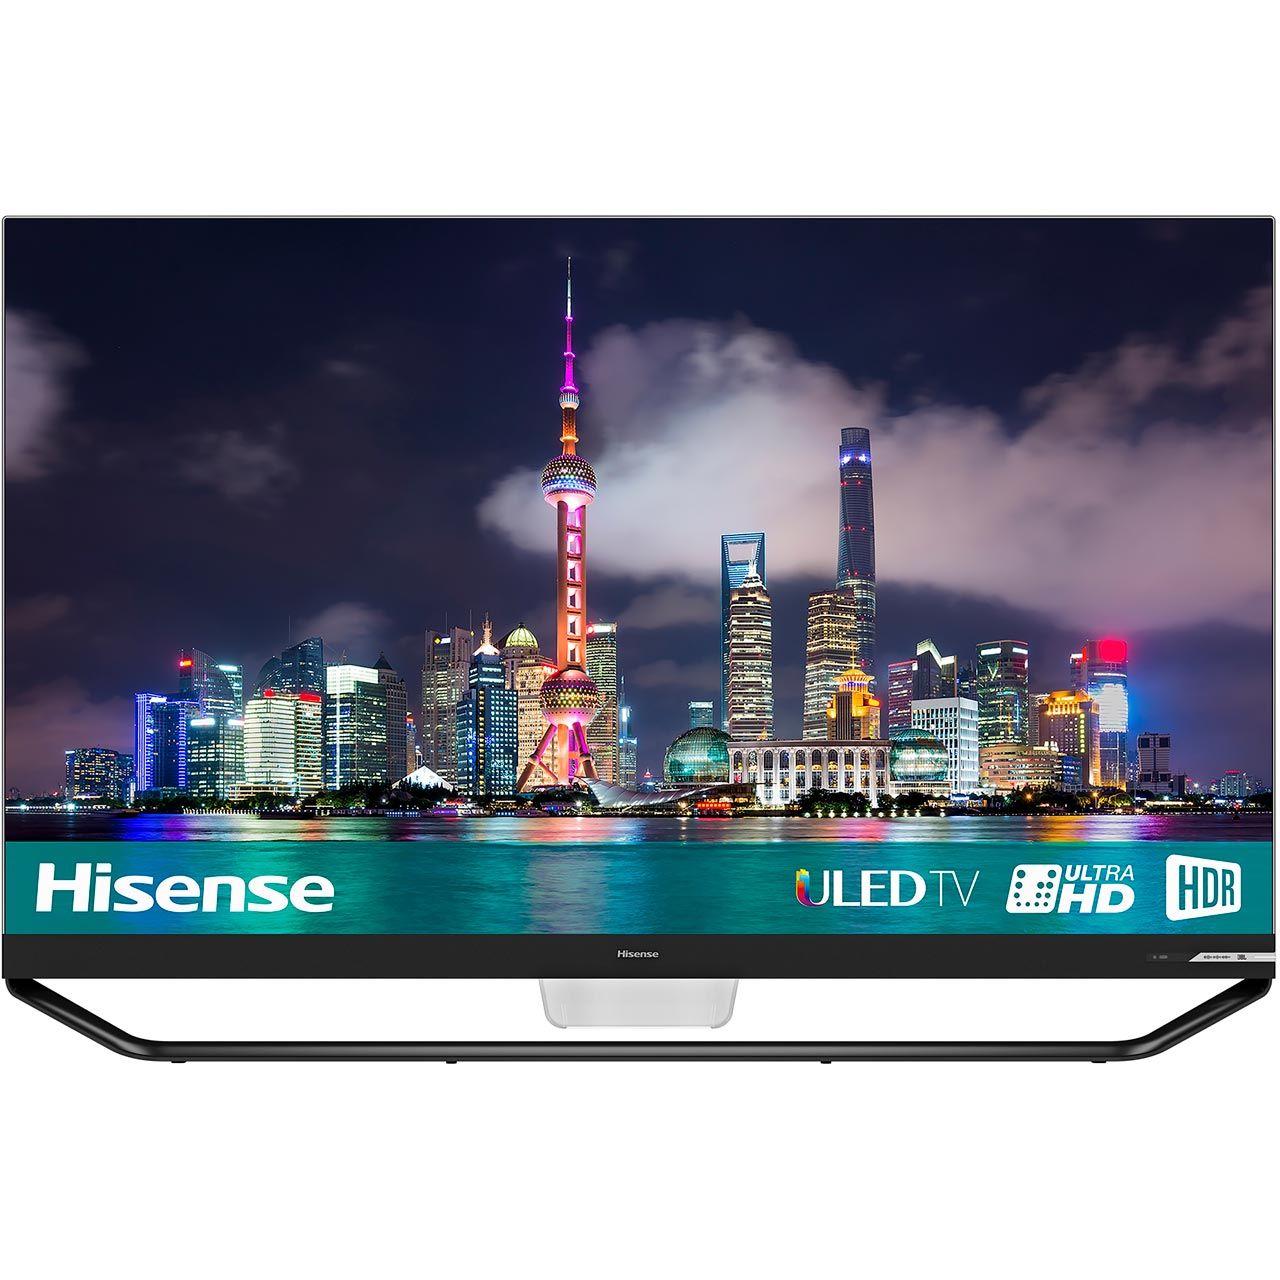 Hisense H65U9AUK 65inch 4K Ultra HD TV £949 @ AO